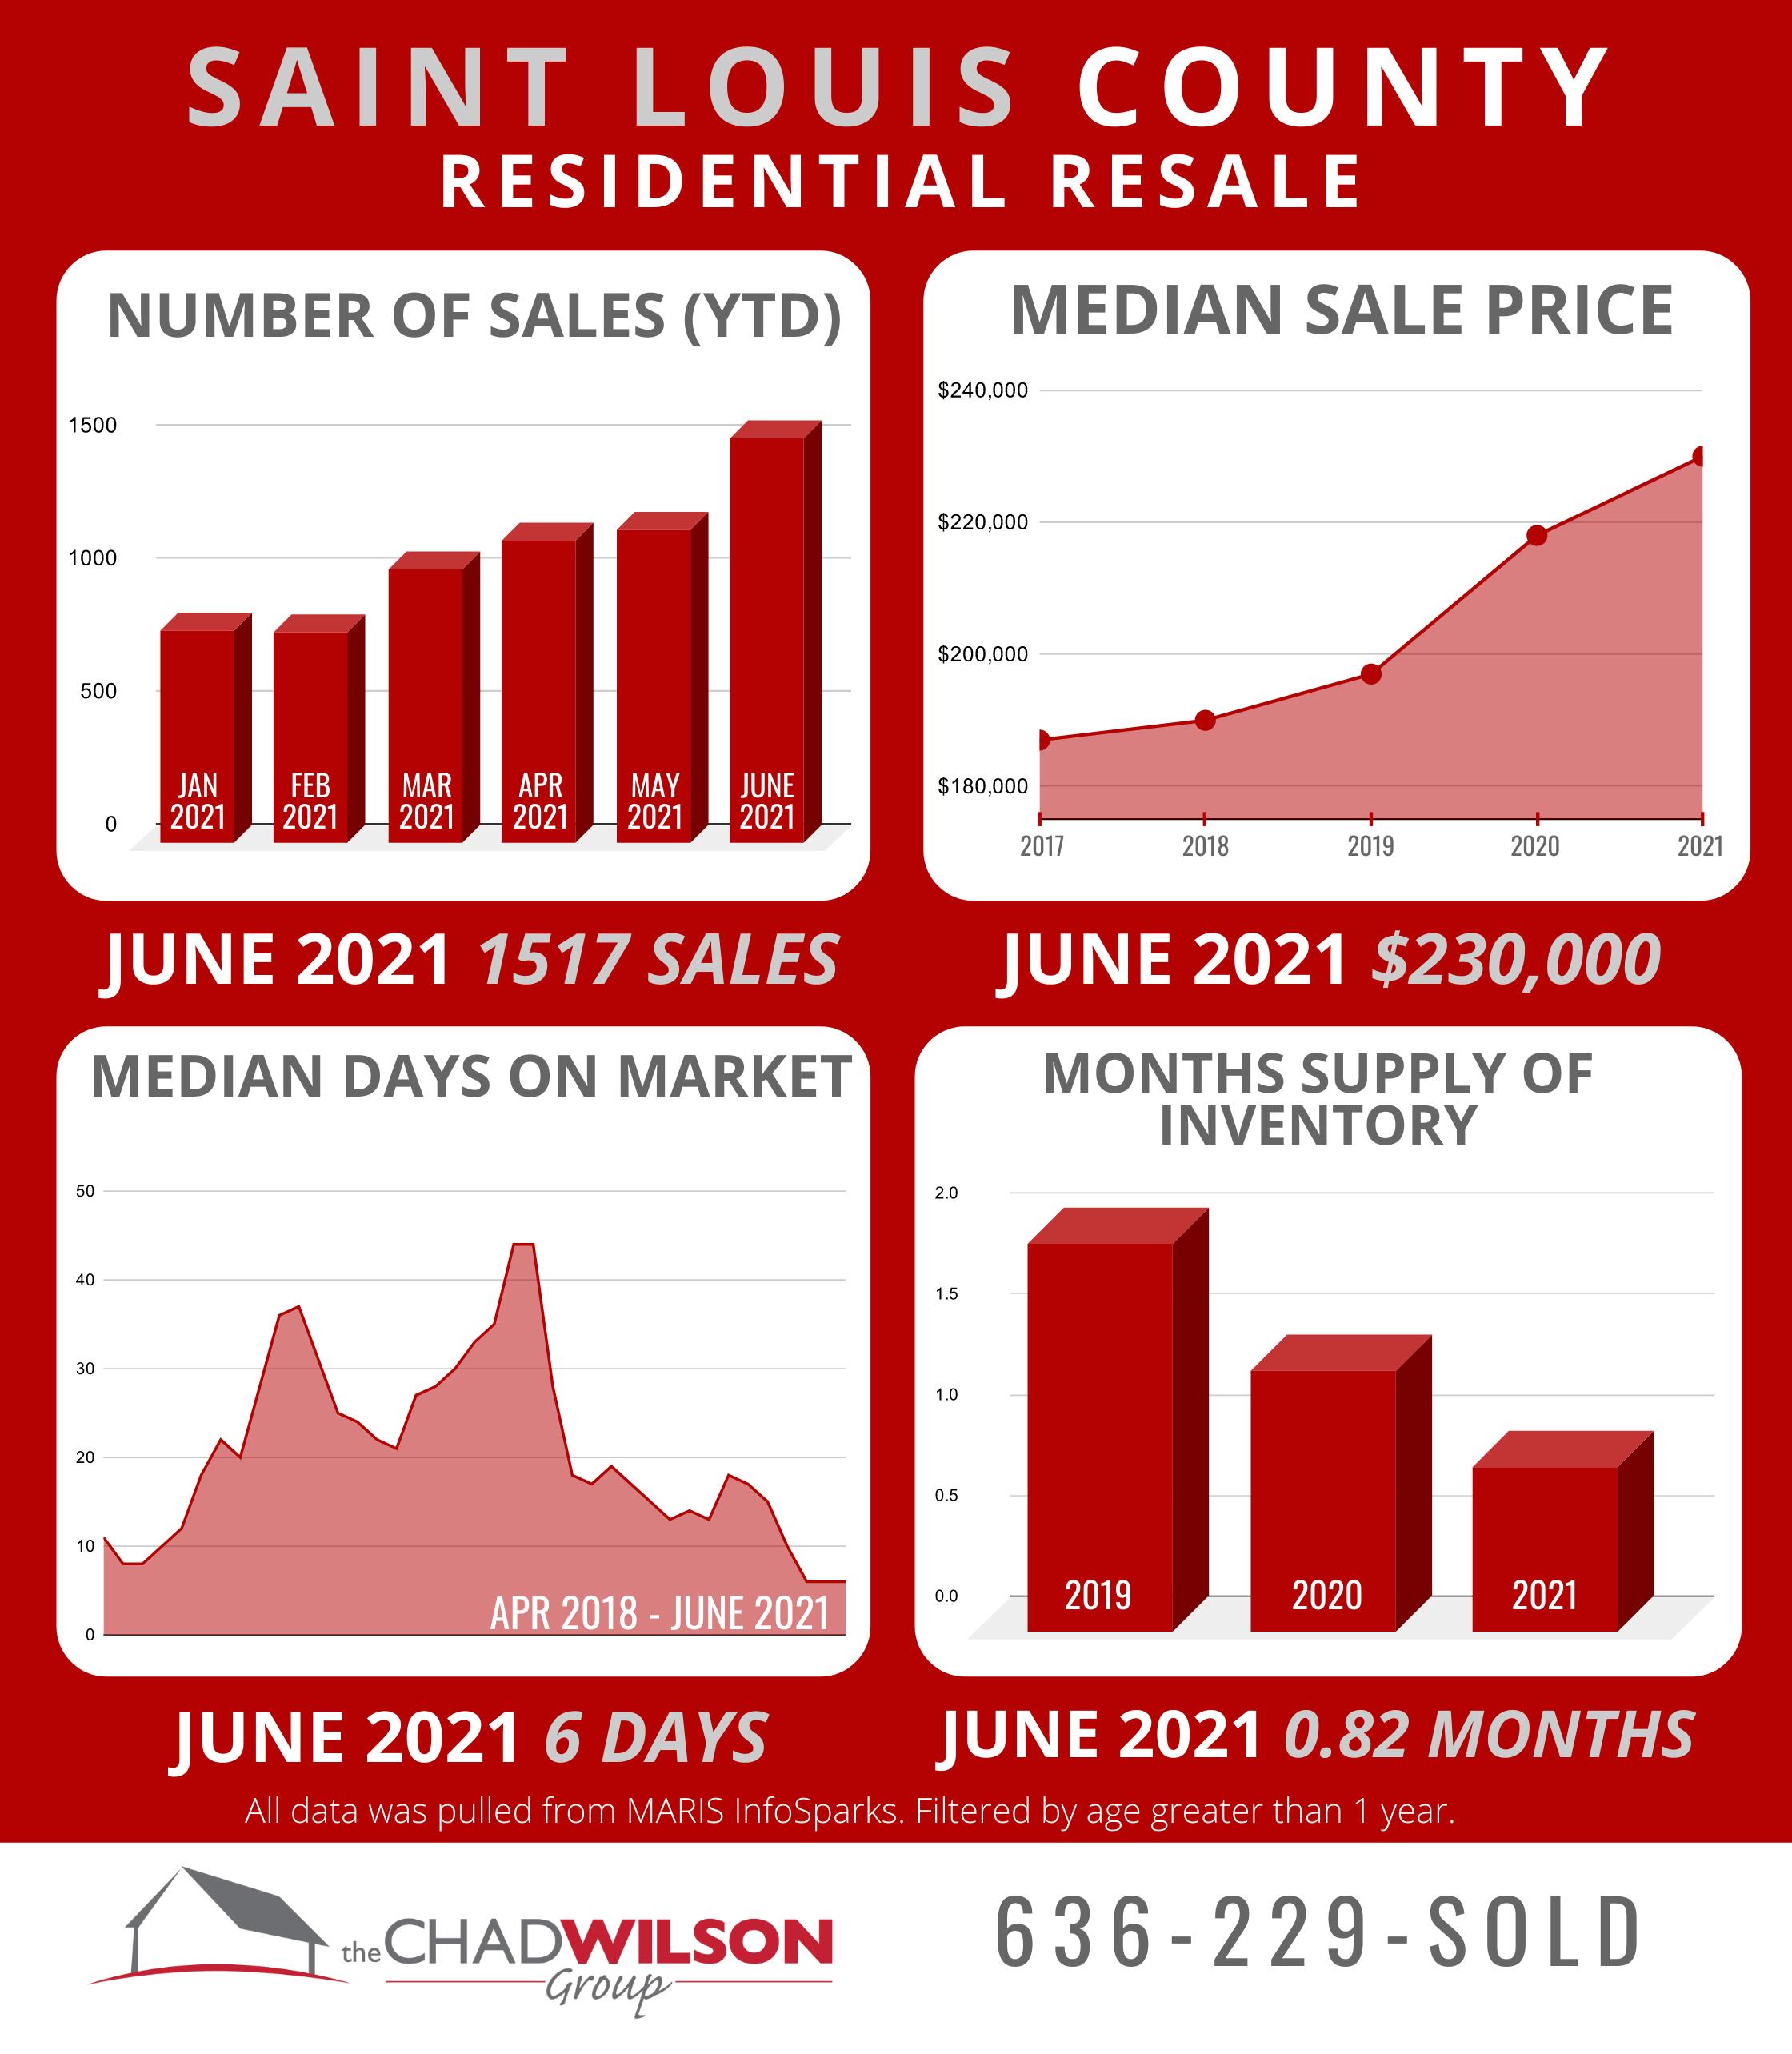 St. Louis County Real Estate Market June 2021